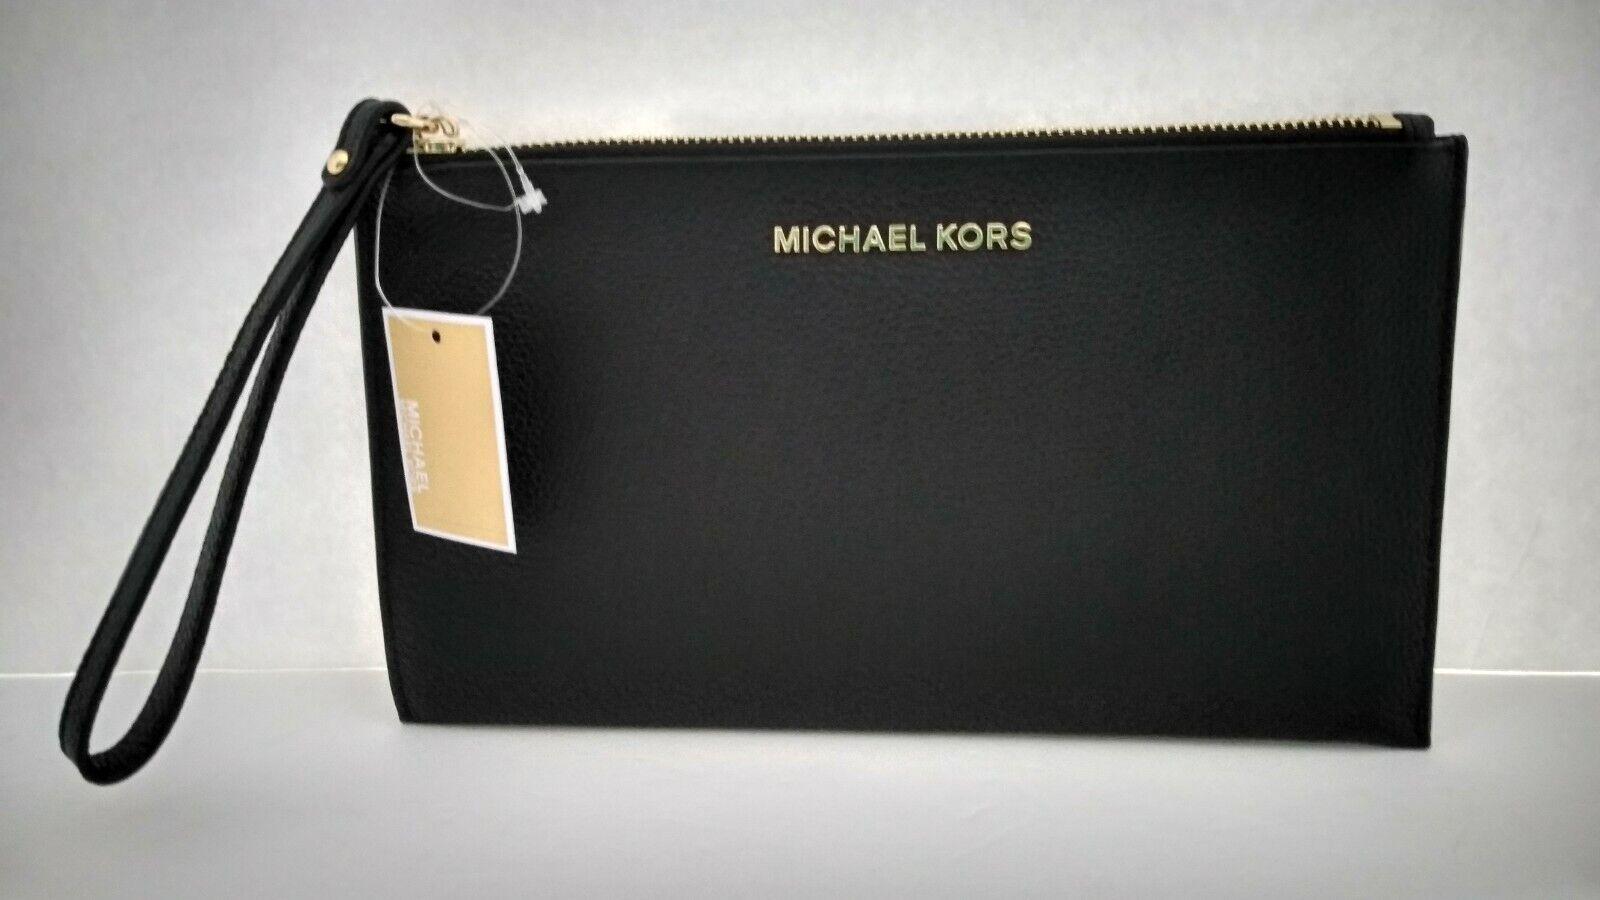 NWT MICHAEL KORS LARGE ZIP CLUTCH WRISTLET BLACK LEATHER $ 9